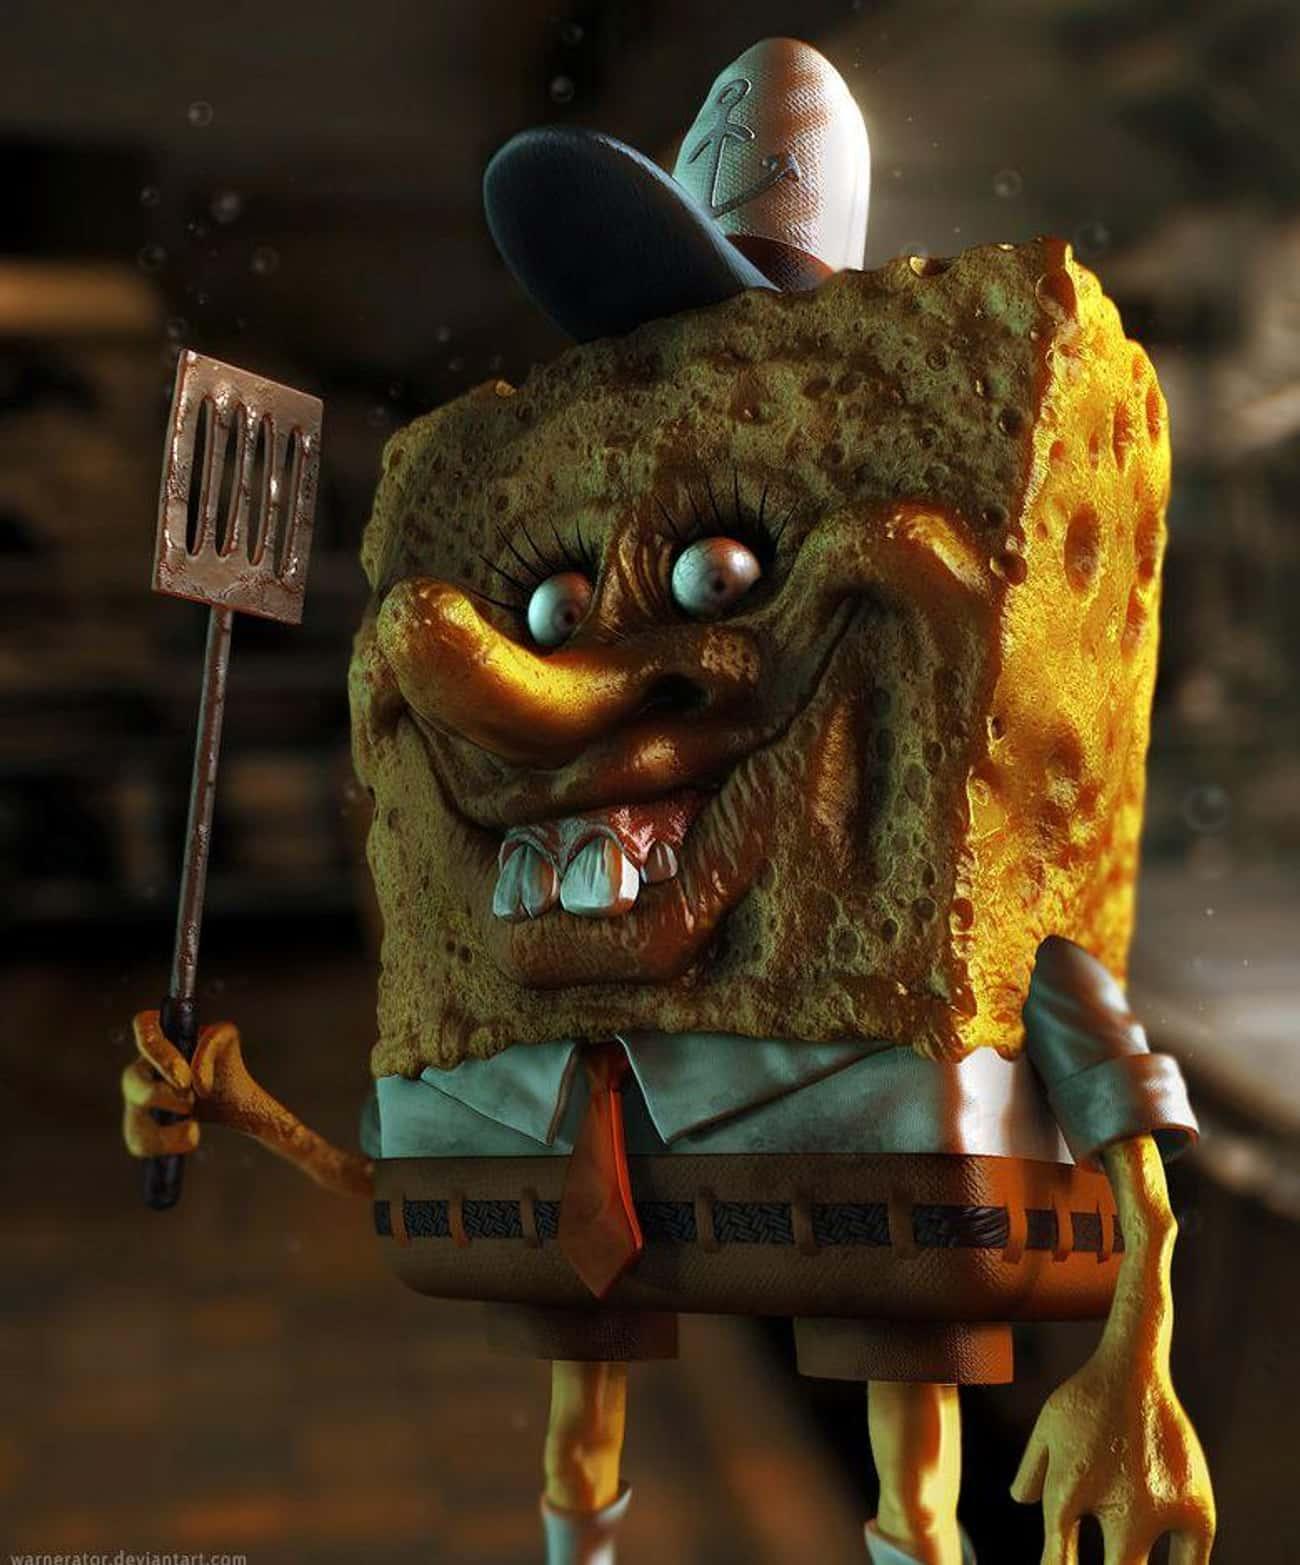 Spongebob: Order Up!